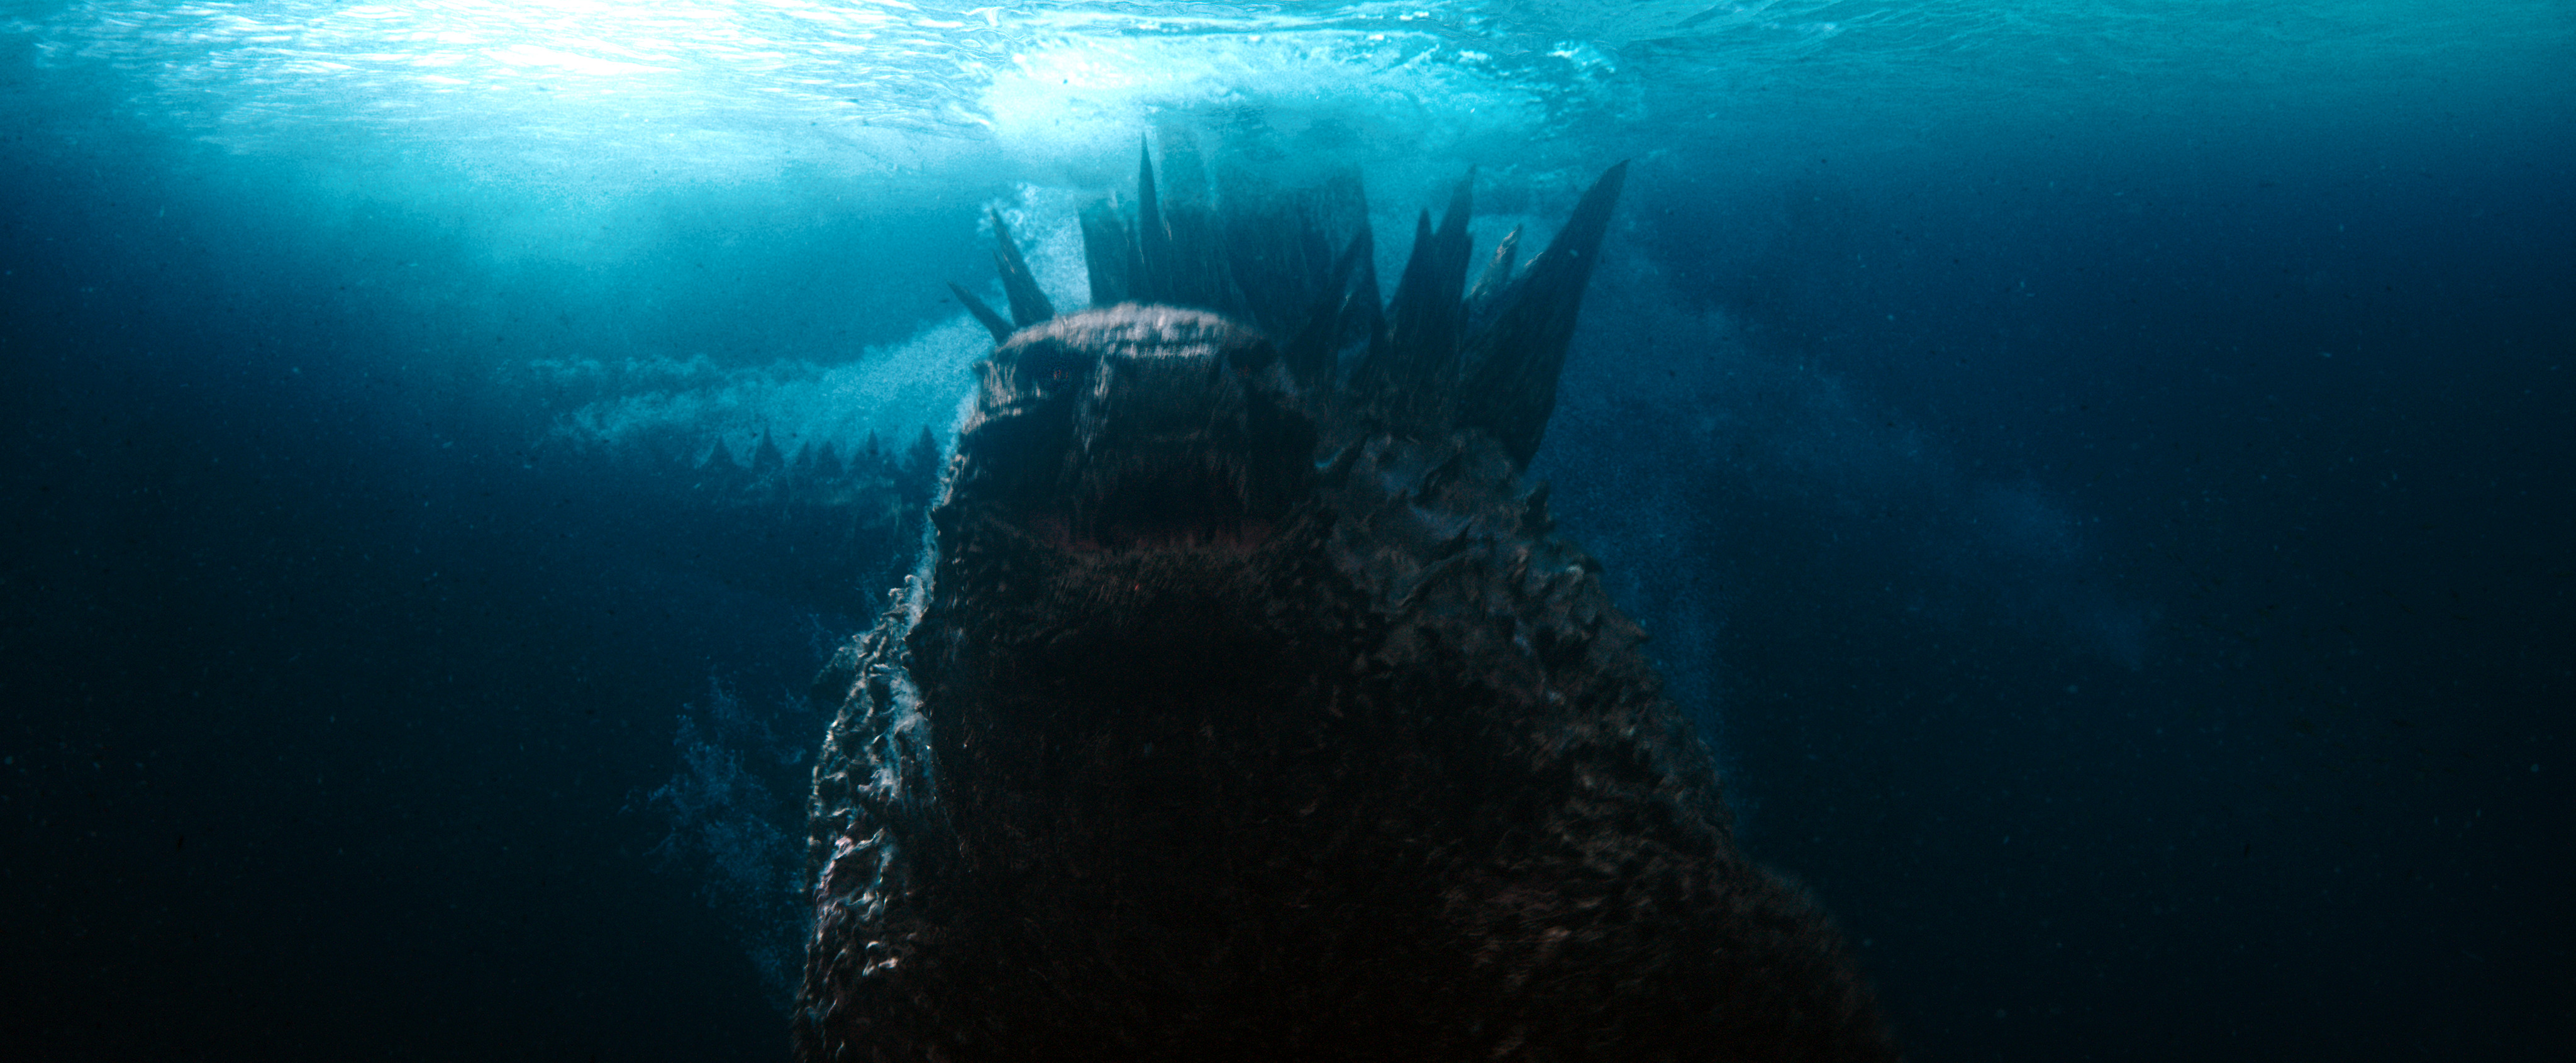 godzilla vs kong underwater 4k 1618166839 - Godzilla Vs Kong Underwater 4k - Godzilla Vs Kong Underwater 4k wallpapers